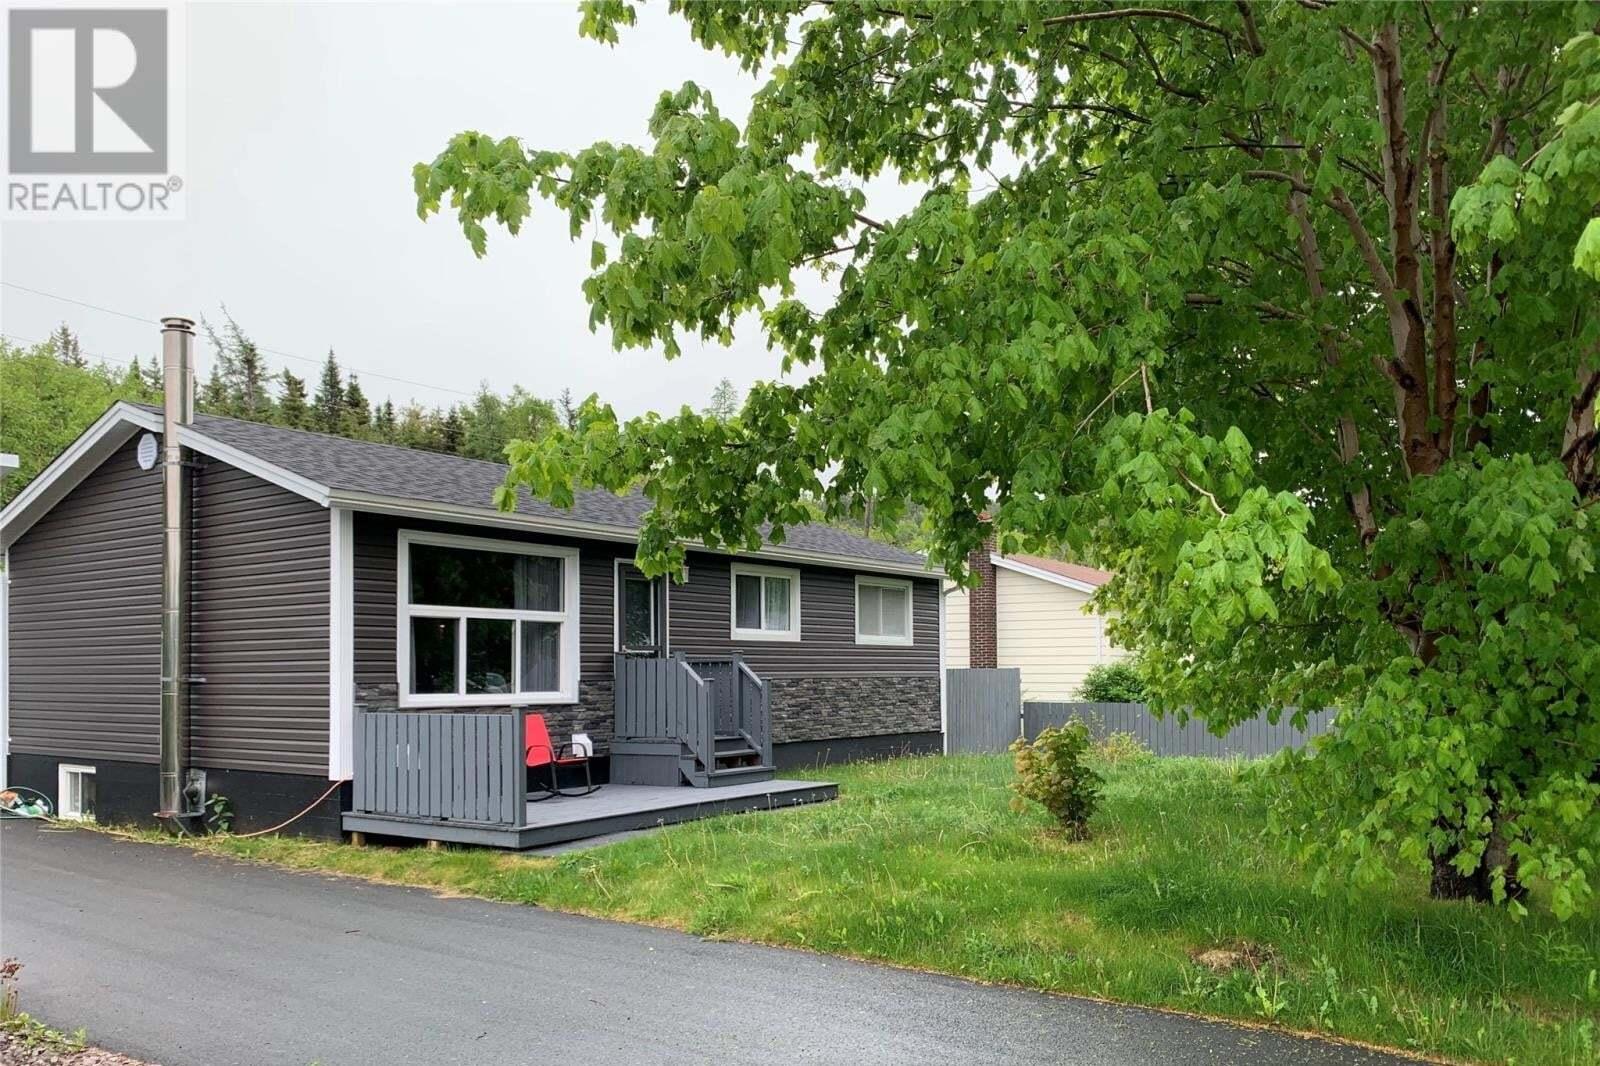 House for sale at 26 Highland Pk Holyrood Newfoundland - MLS: 1216261